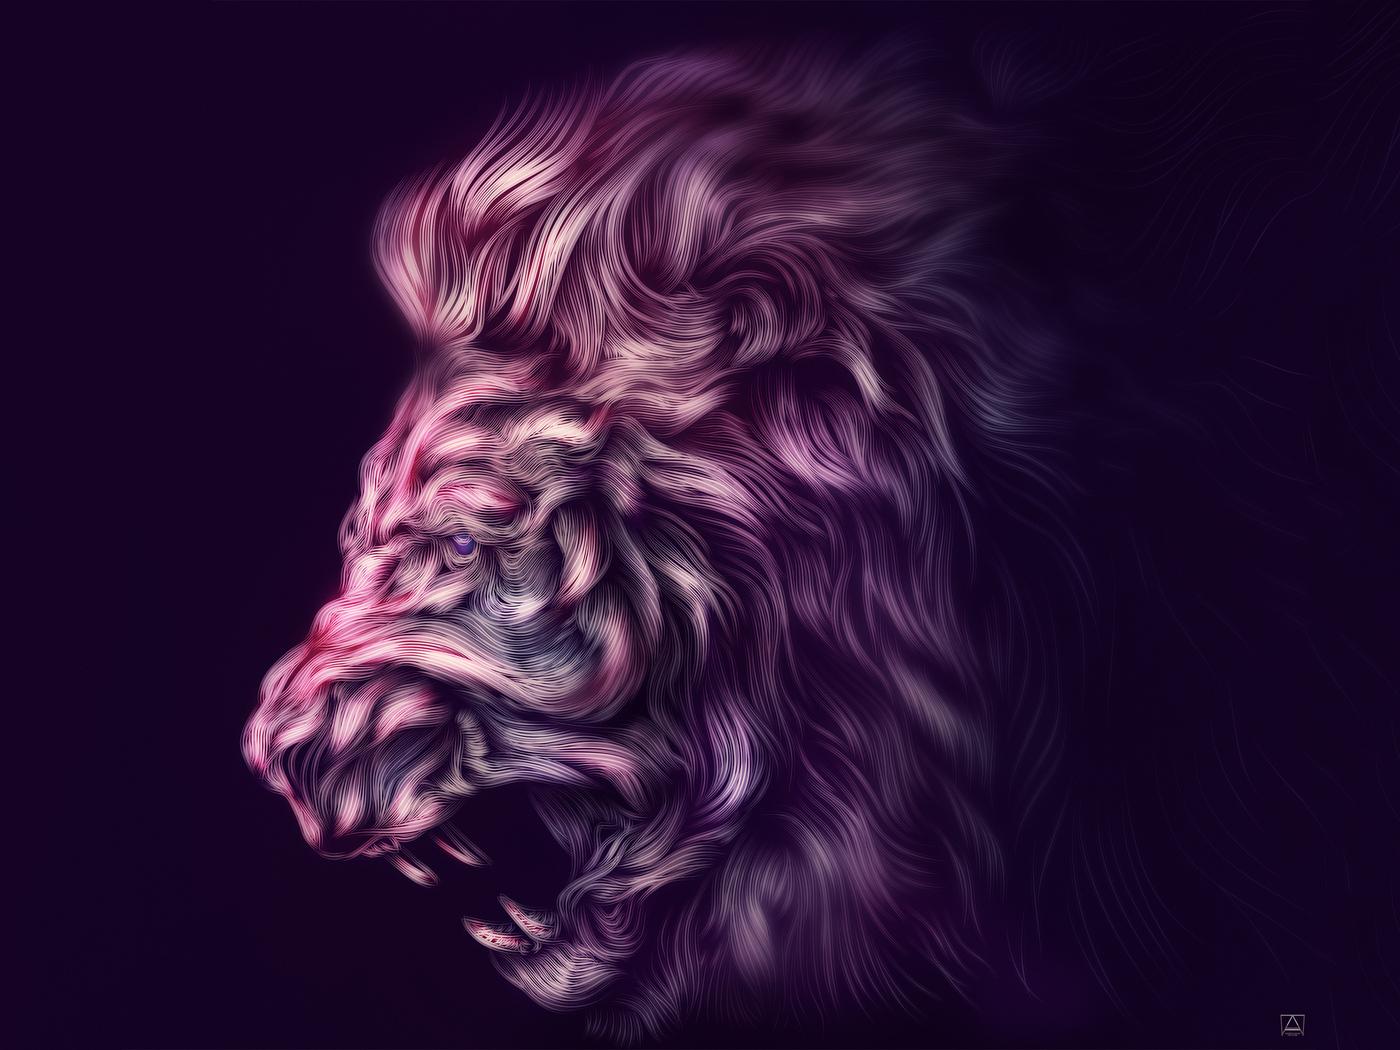 tiger-graphic-design-digital-art-4k-zi.jpg